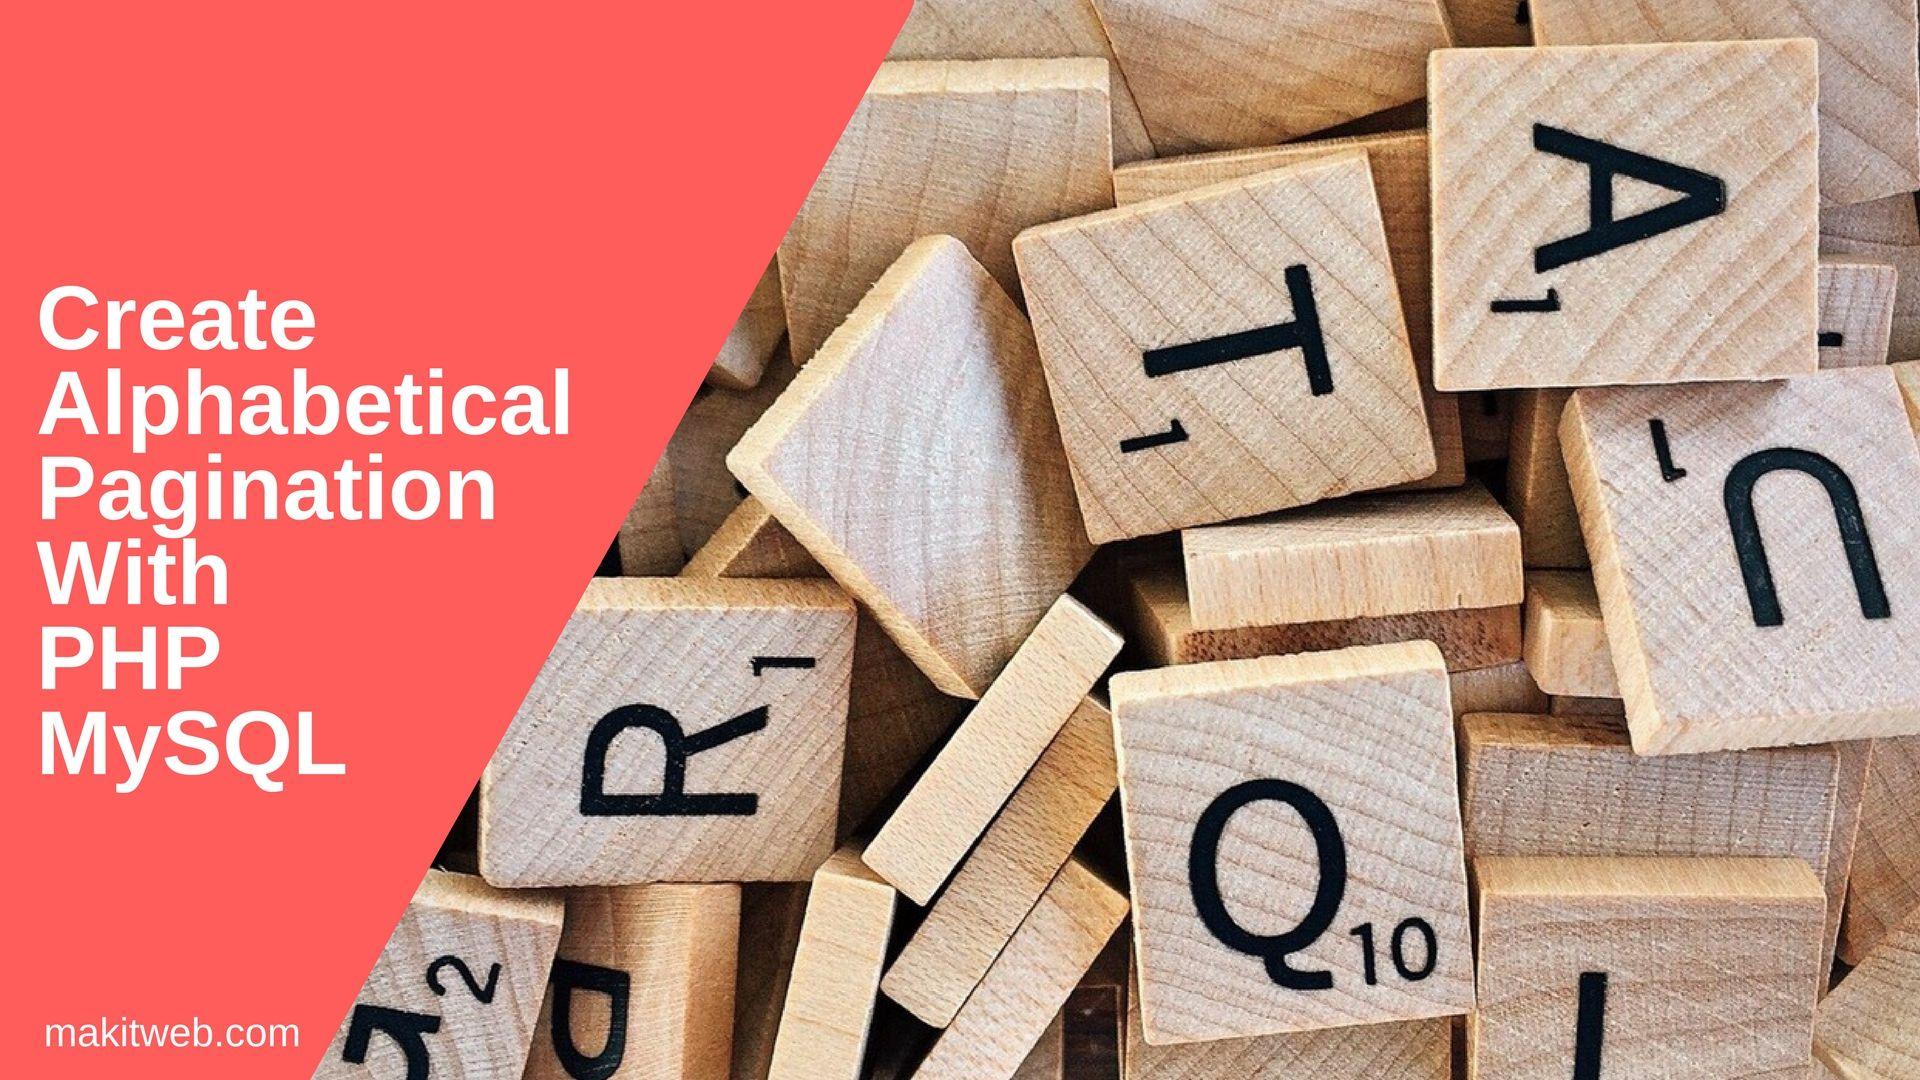 Create alphabetical pagination with PHP MySQL | Makitweb